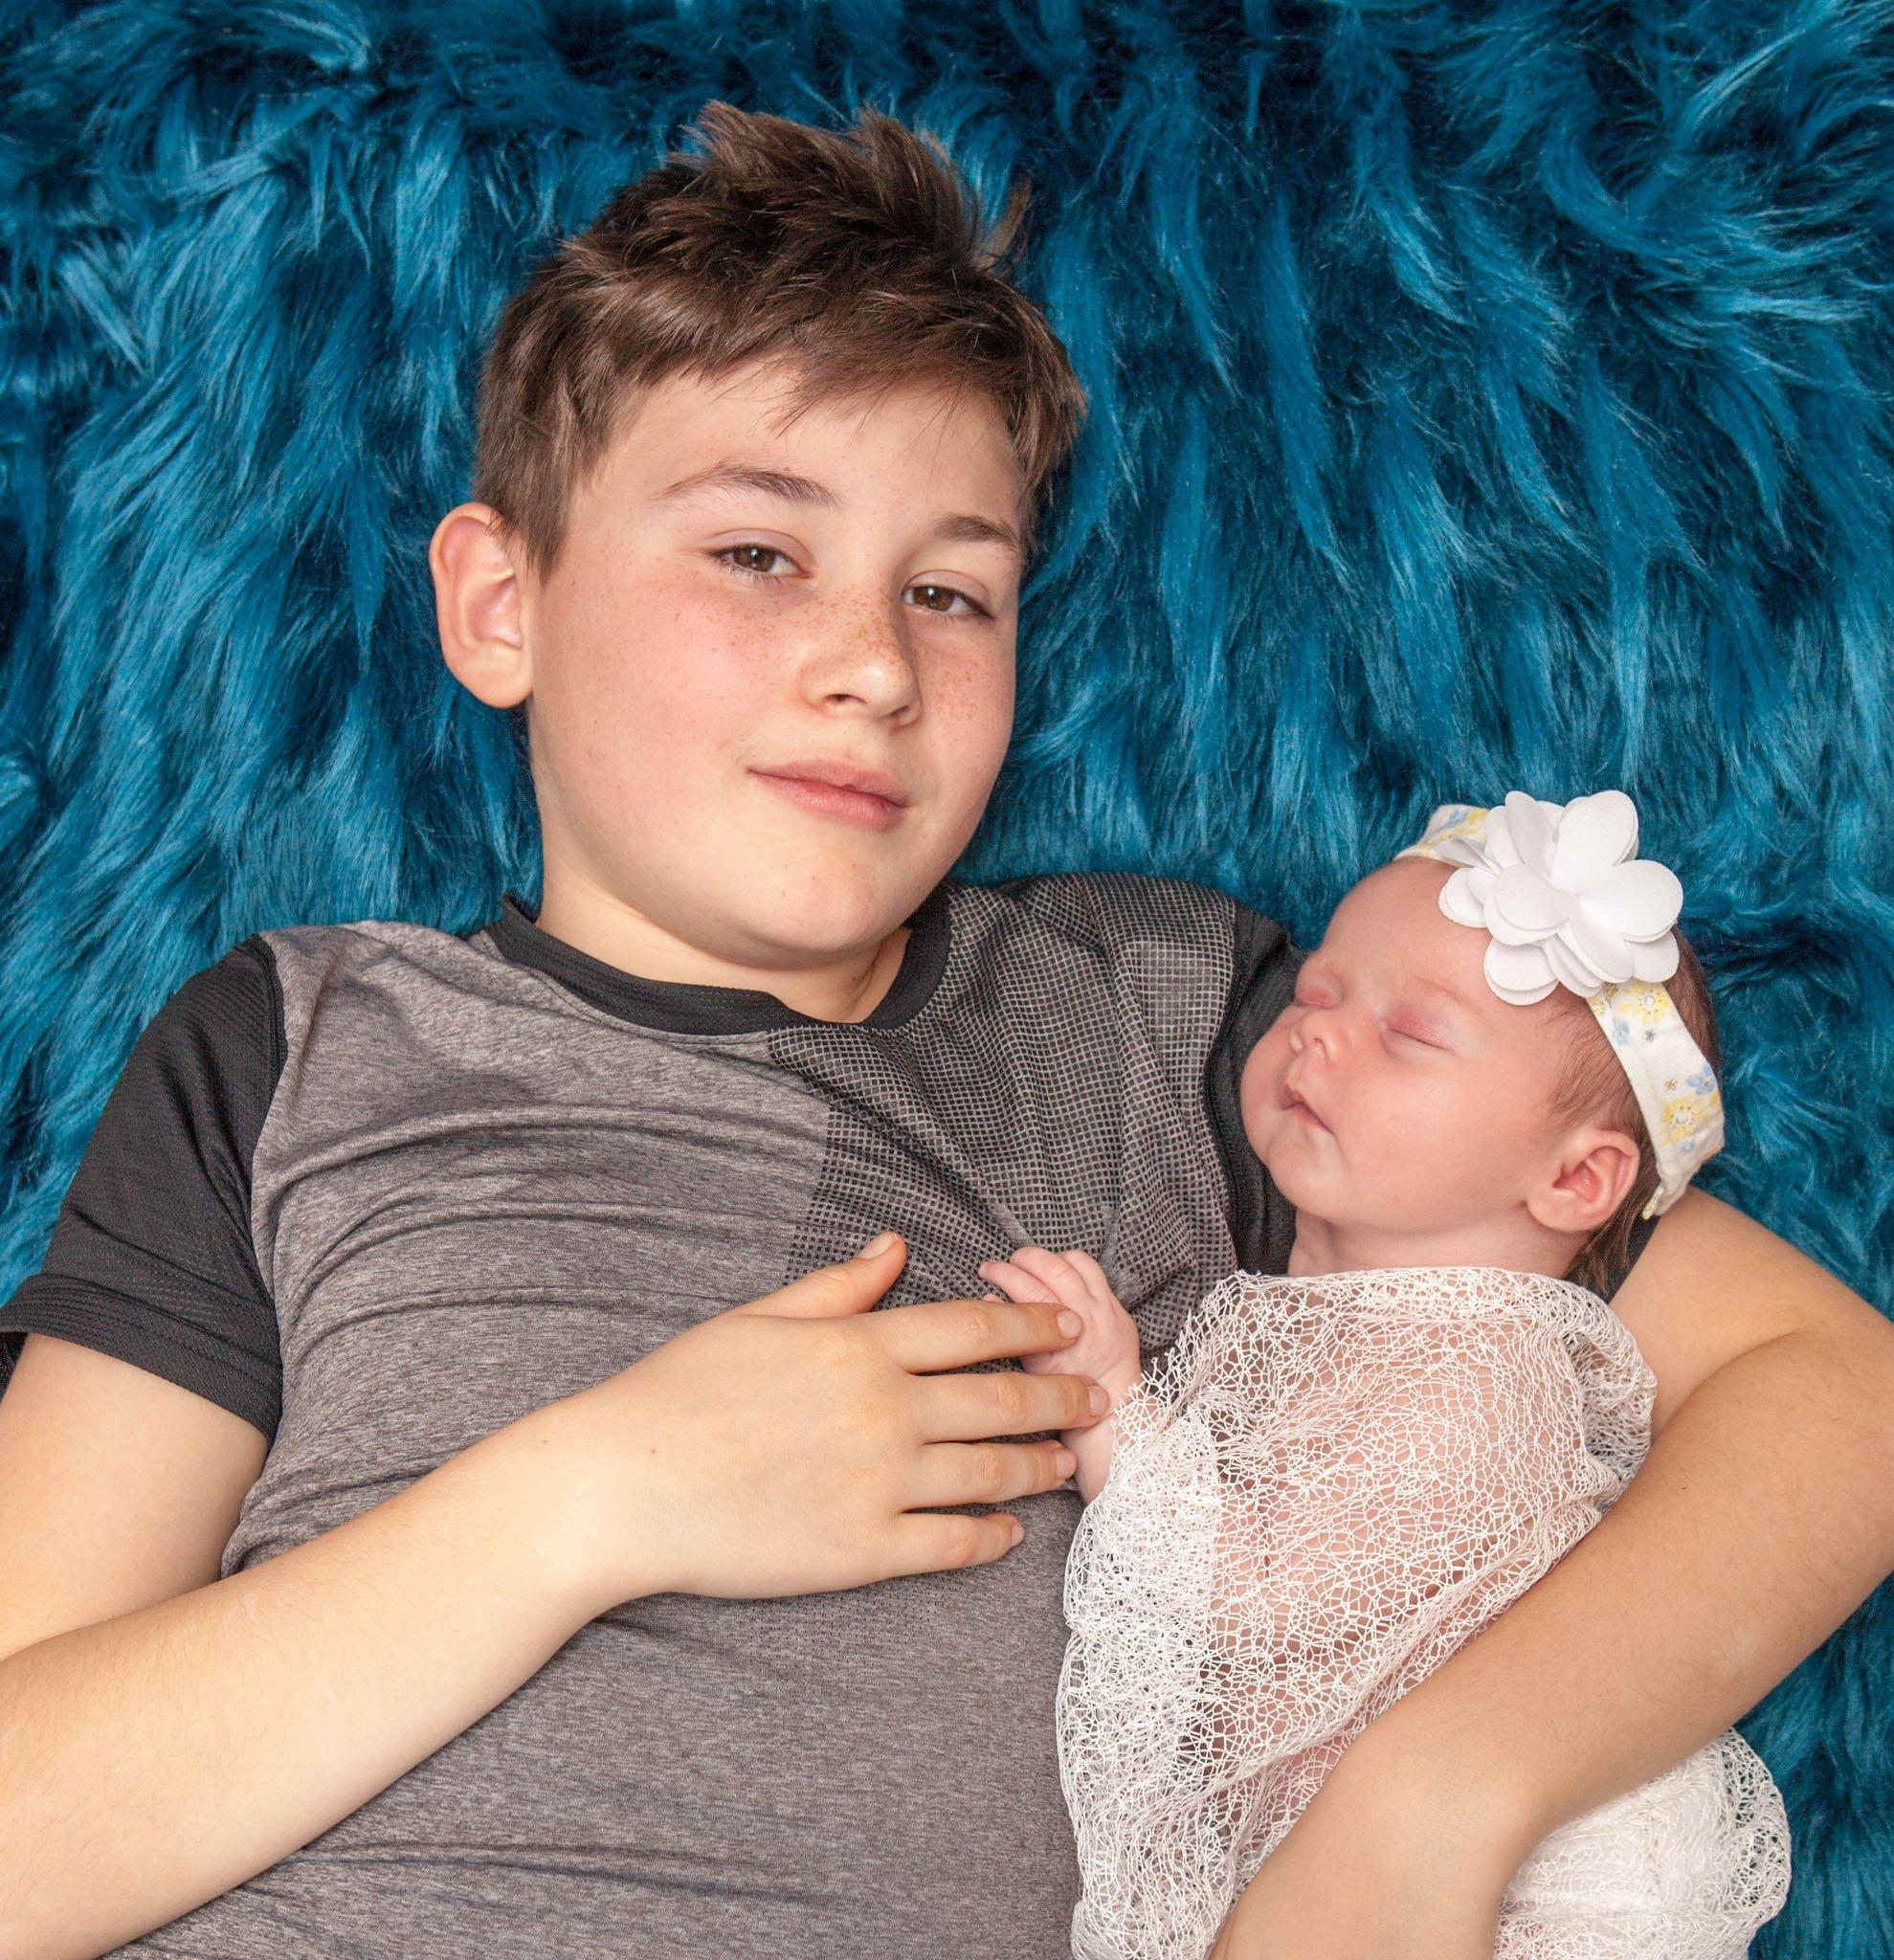 Newborn Session with Eva-Rose, big brother Dylan, Tania Miller Photographer, Pontypool Newborn Photographer